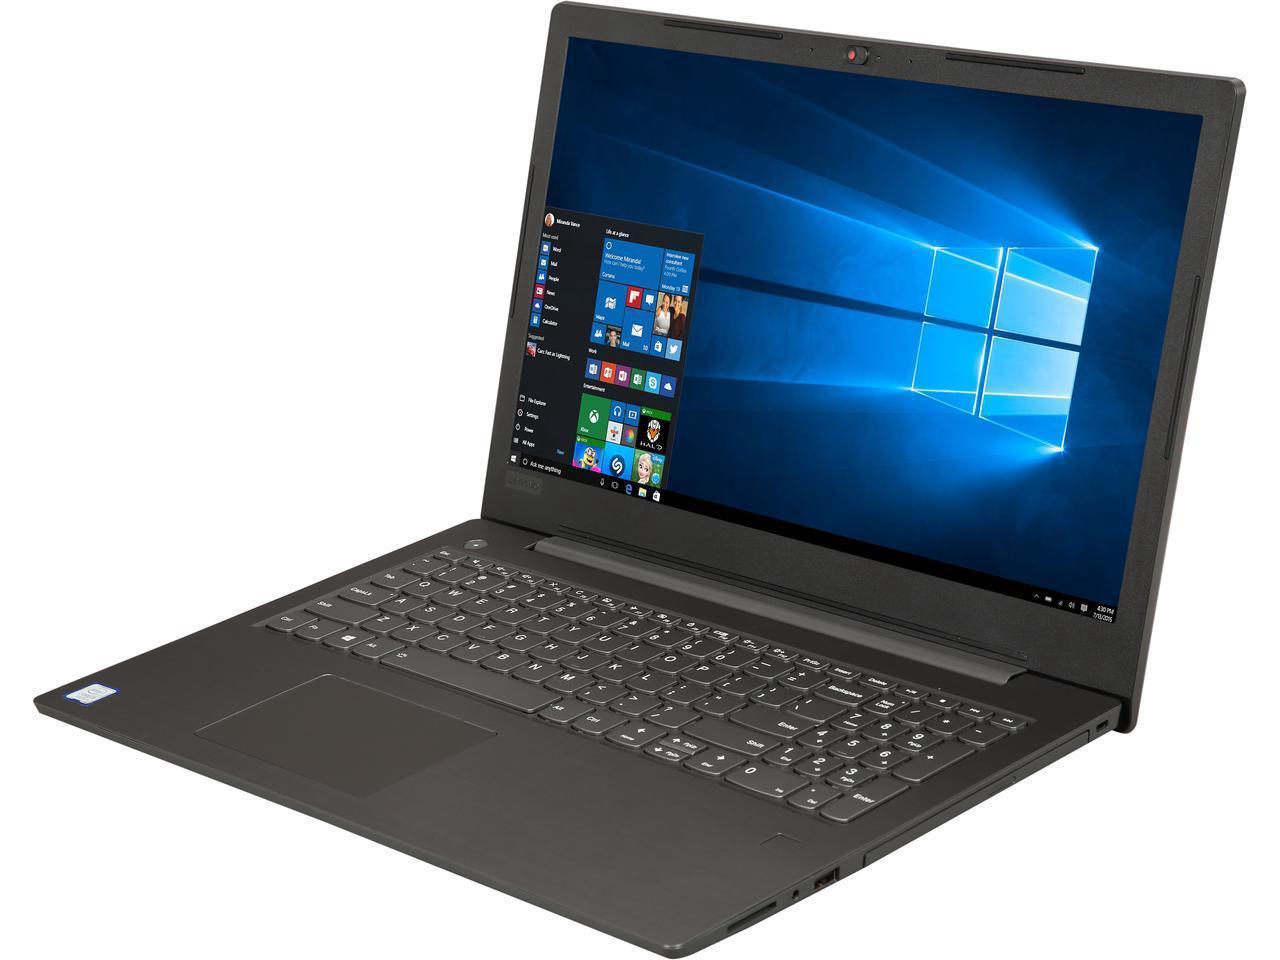 "Lenovo Laptop V330 Intel Core i5 7th Gen 7200U (2.50 GHz) 8 GB Memory 256GB M.2 PCIe SSD Intel HD Graphics 620 15.6"" Windows 10 Pro 64-Bit -$449.99 Shipped"